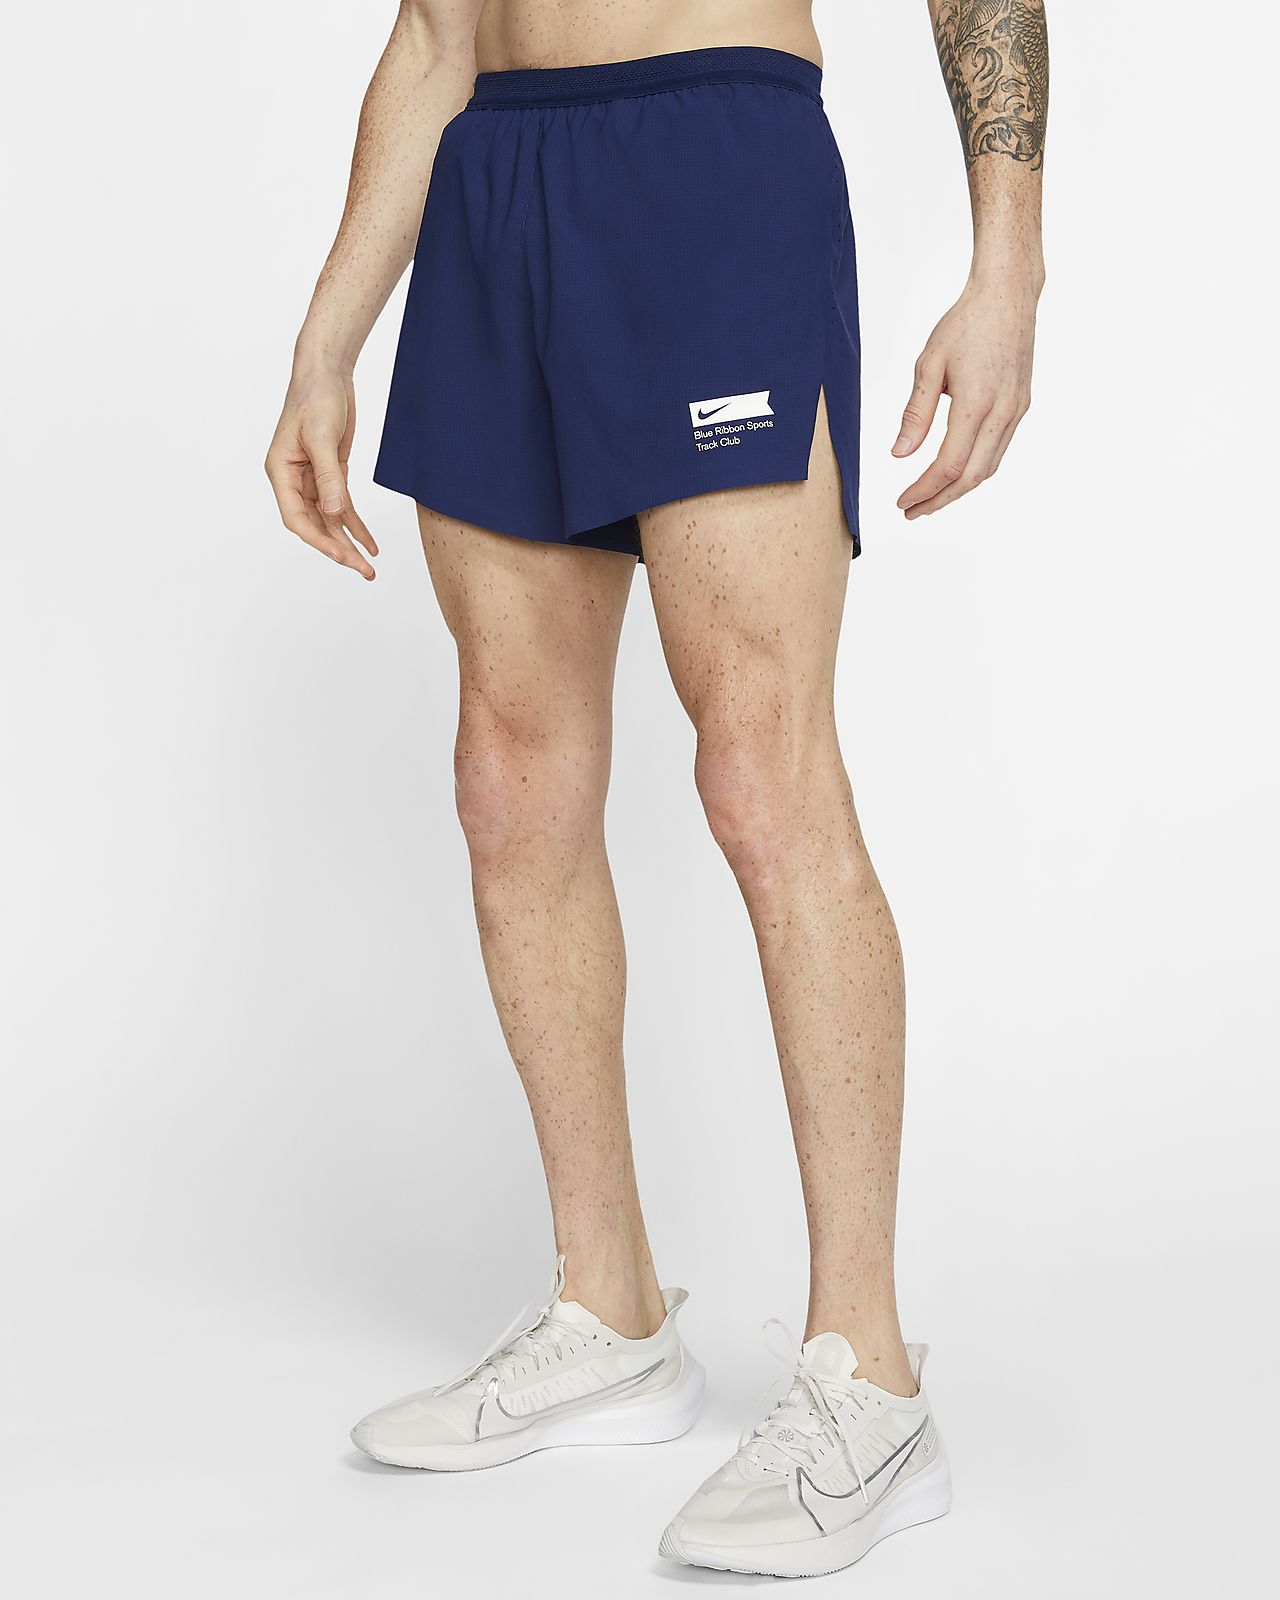 Nike AeroSwift Blue Ribbon Sports 11cm (approx.) Running Shorts